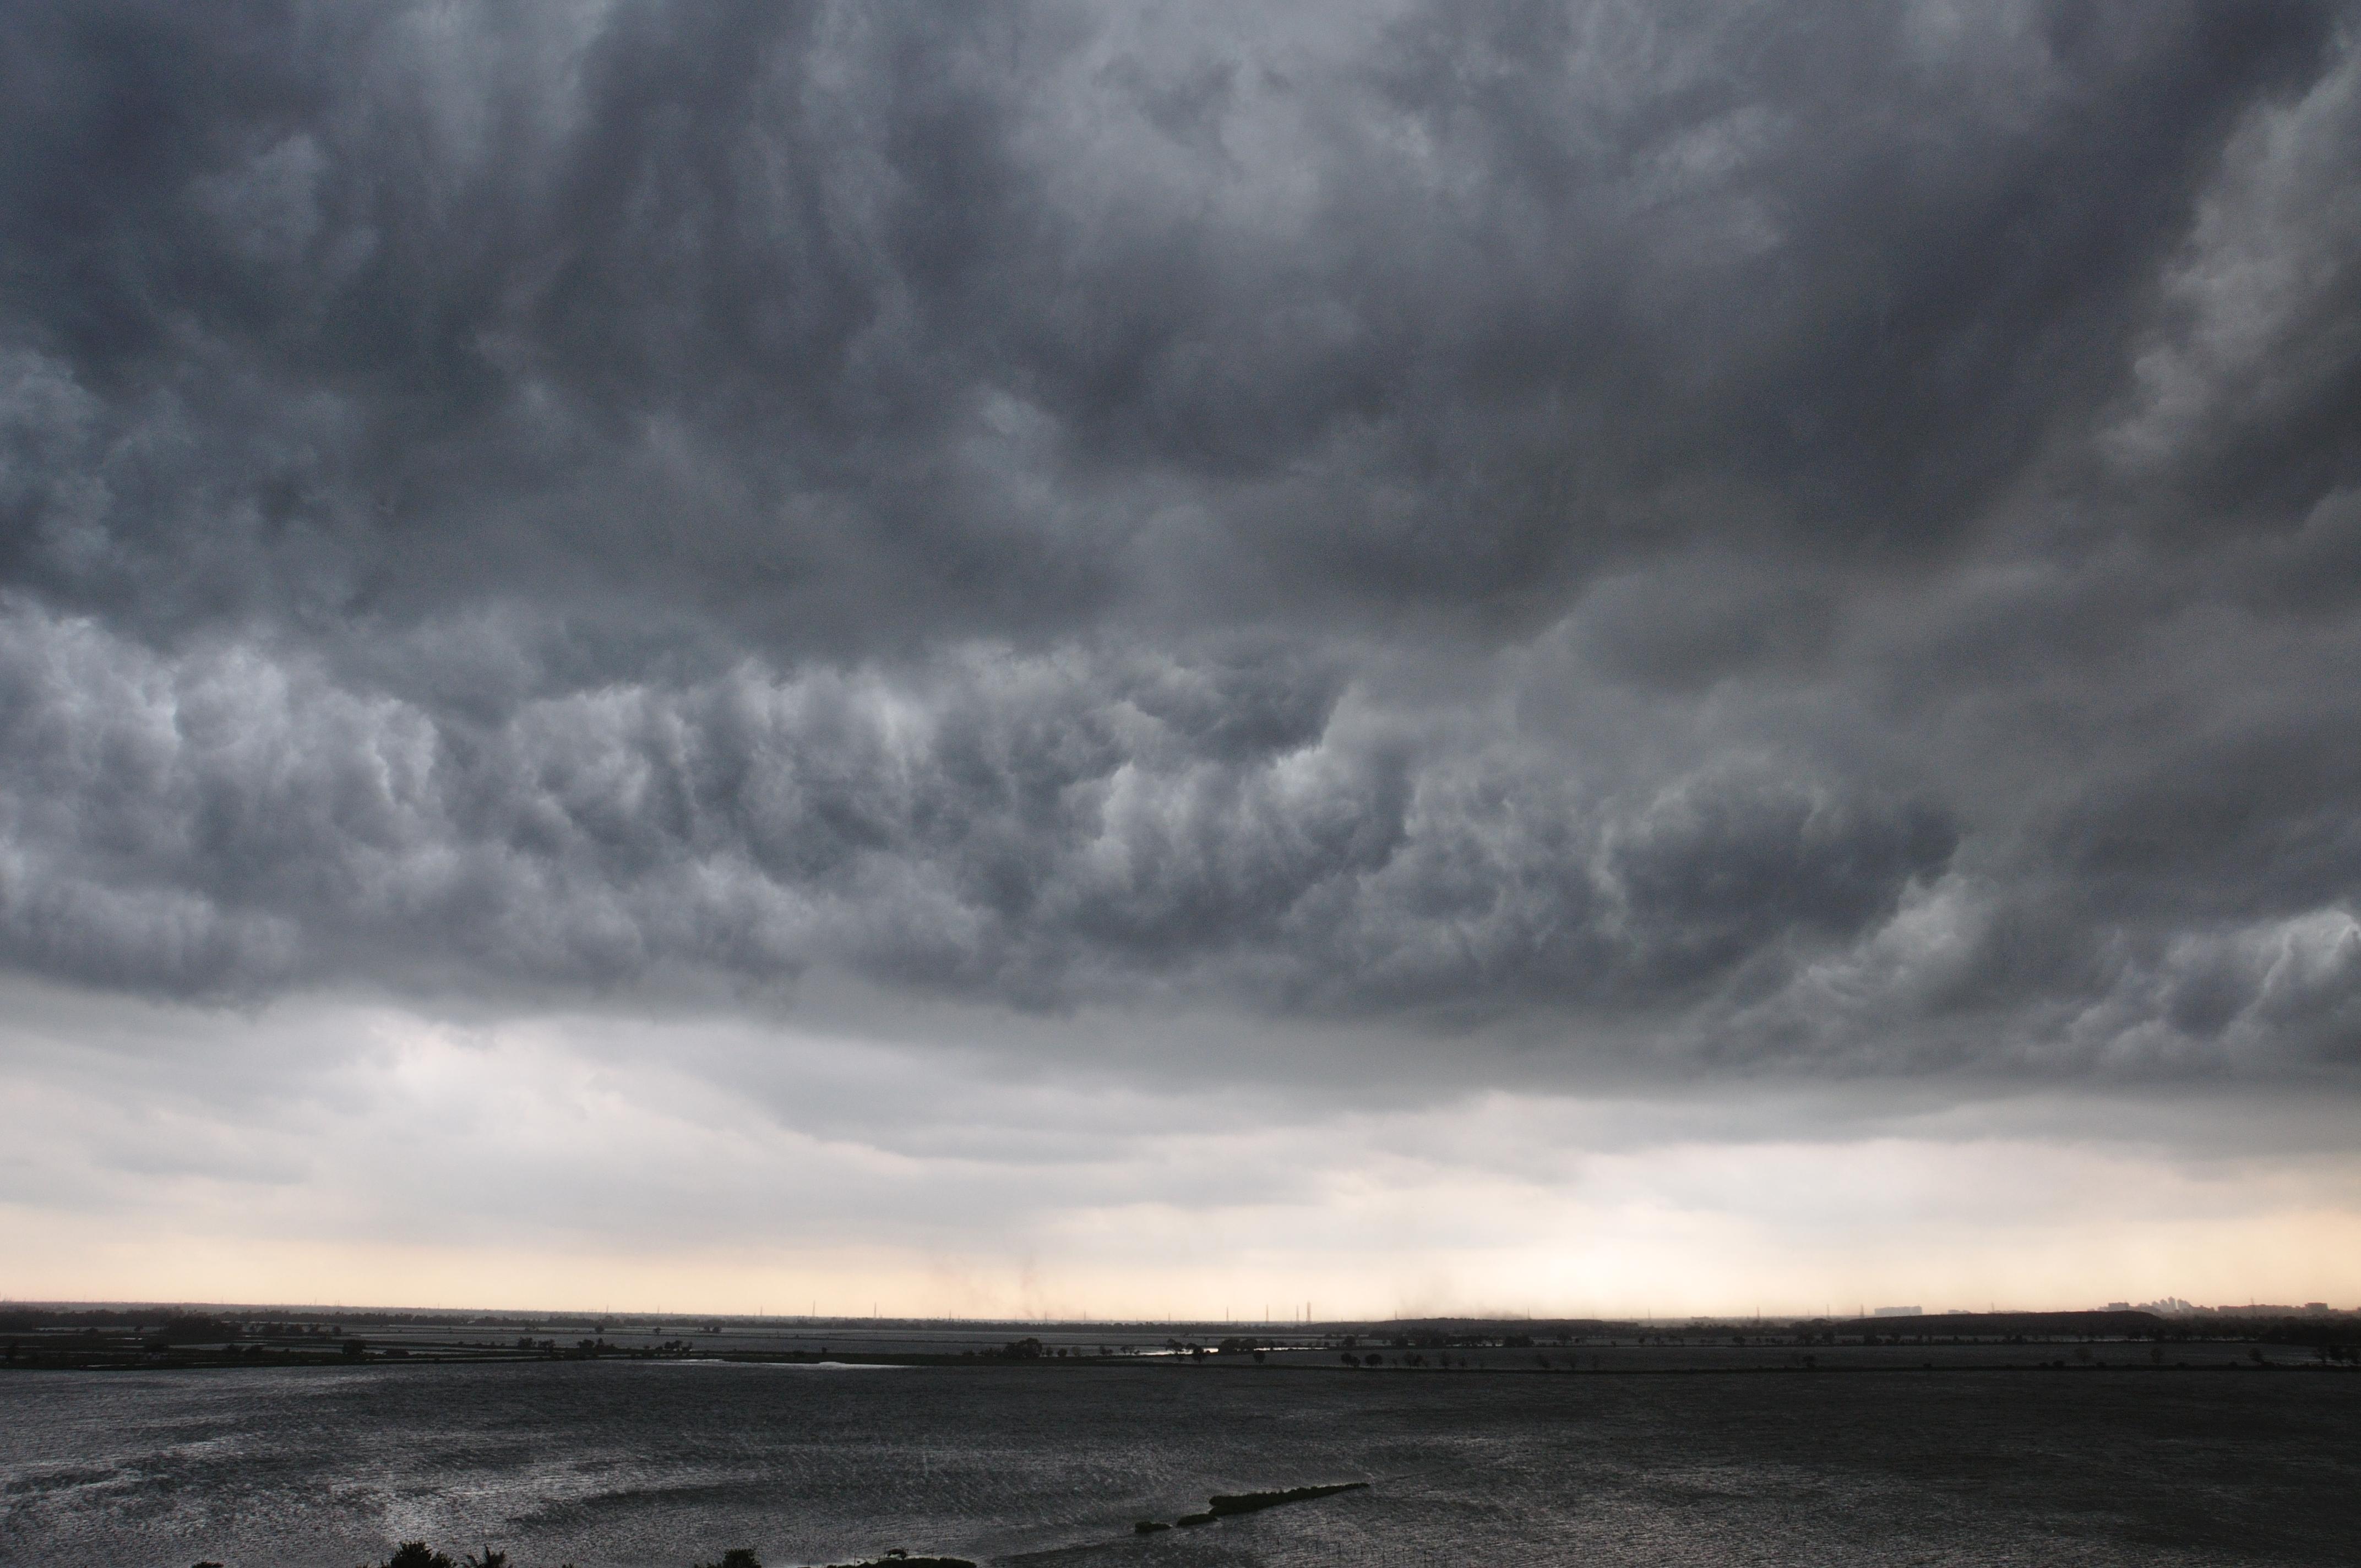 Thunderstorm Wikipedia Upcomingcarshq Com